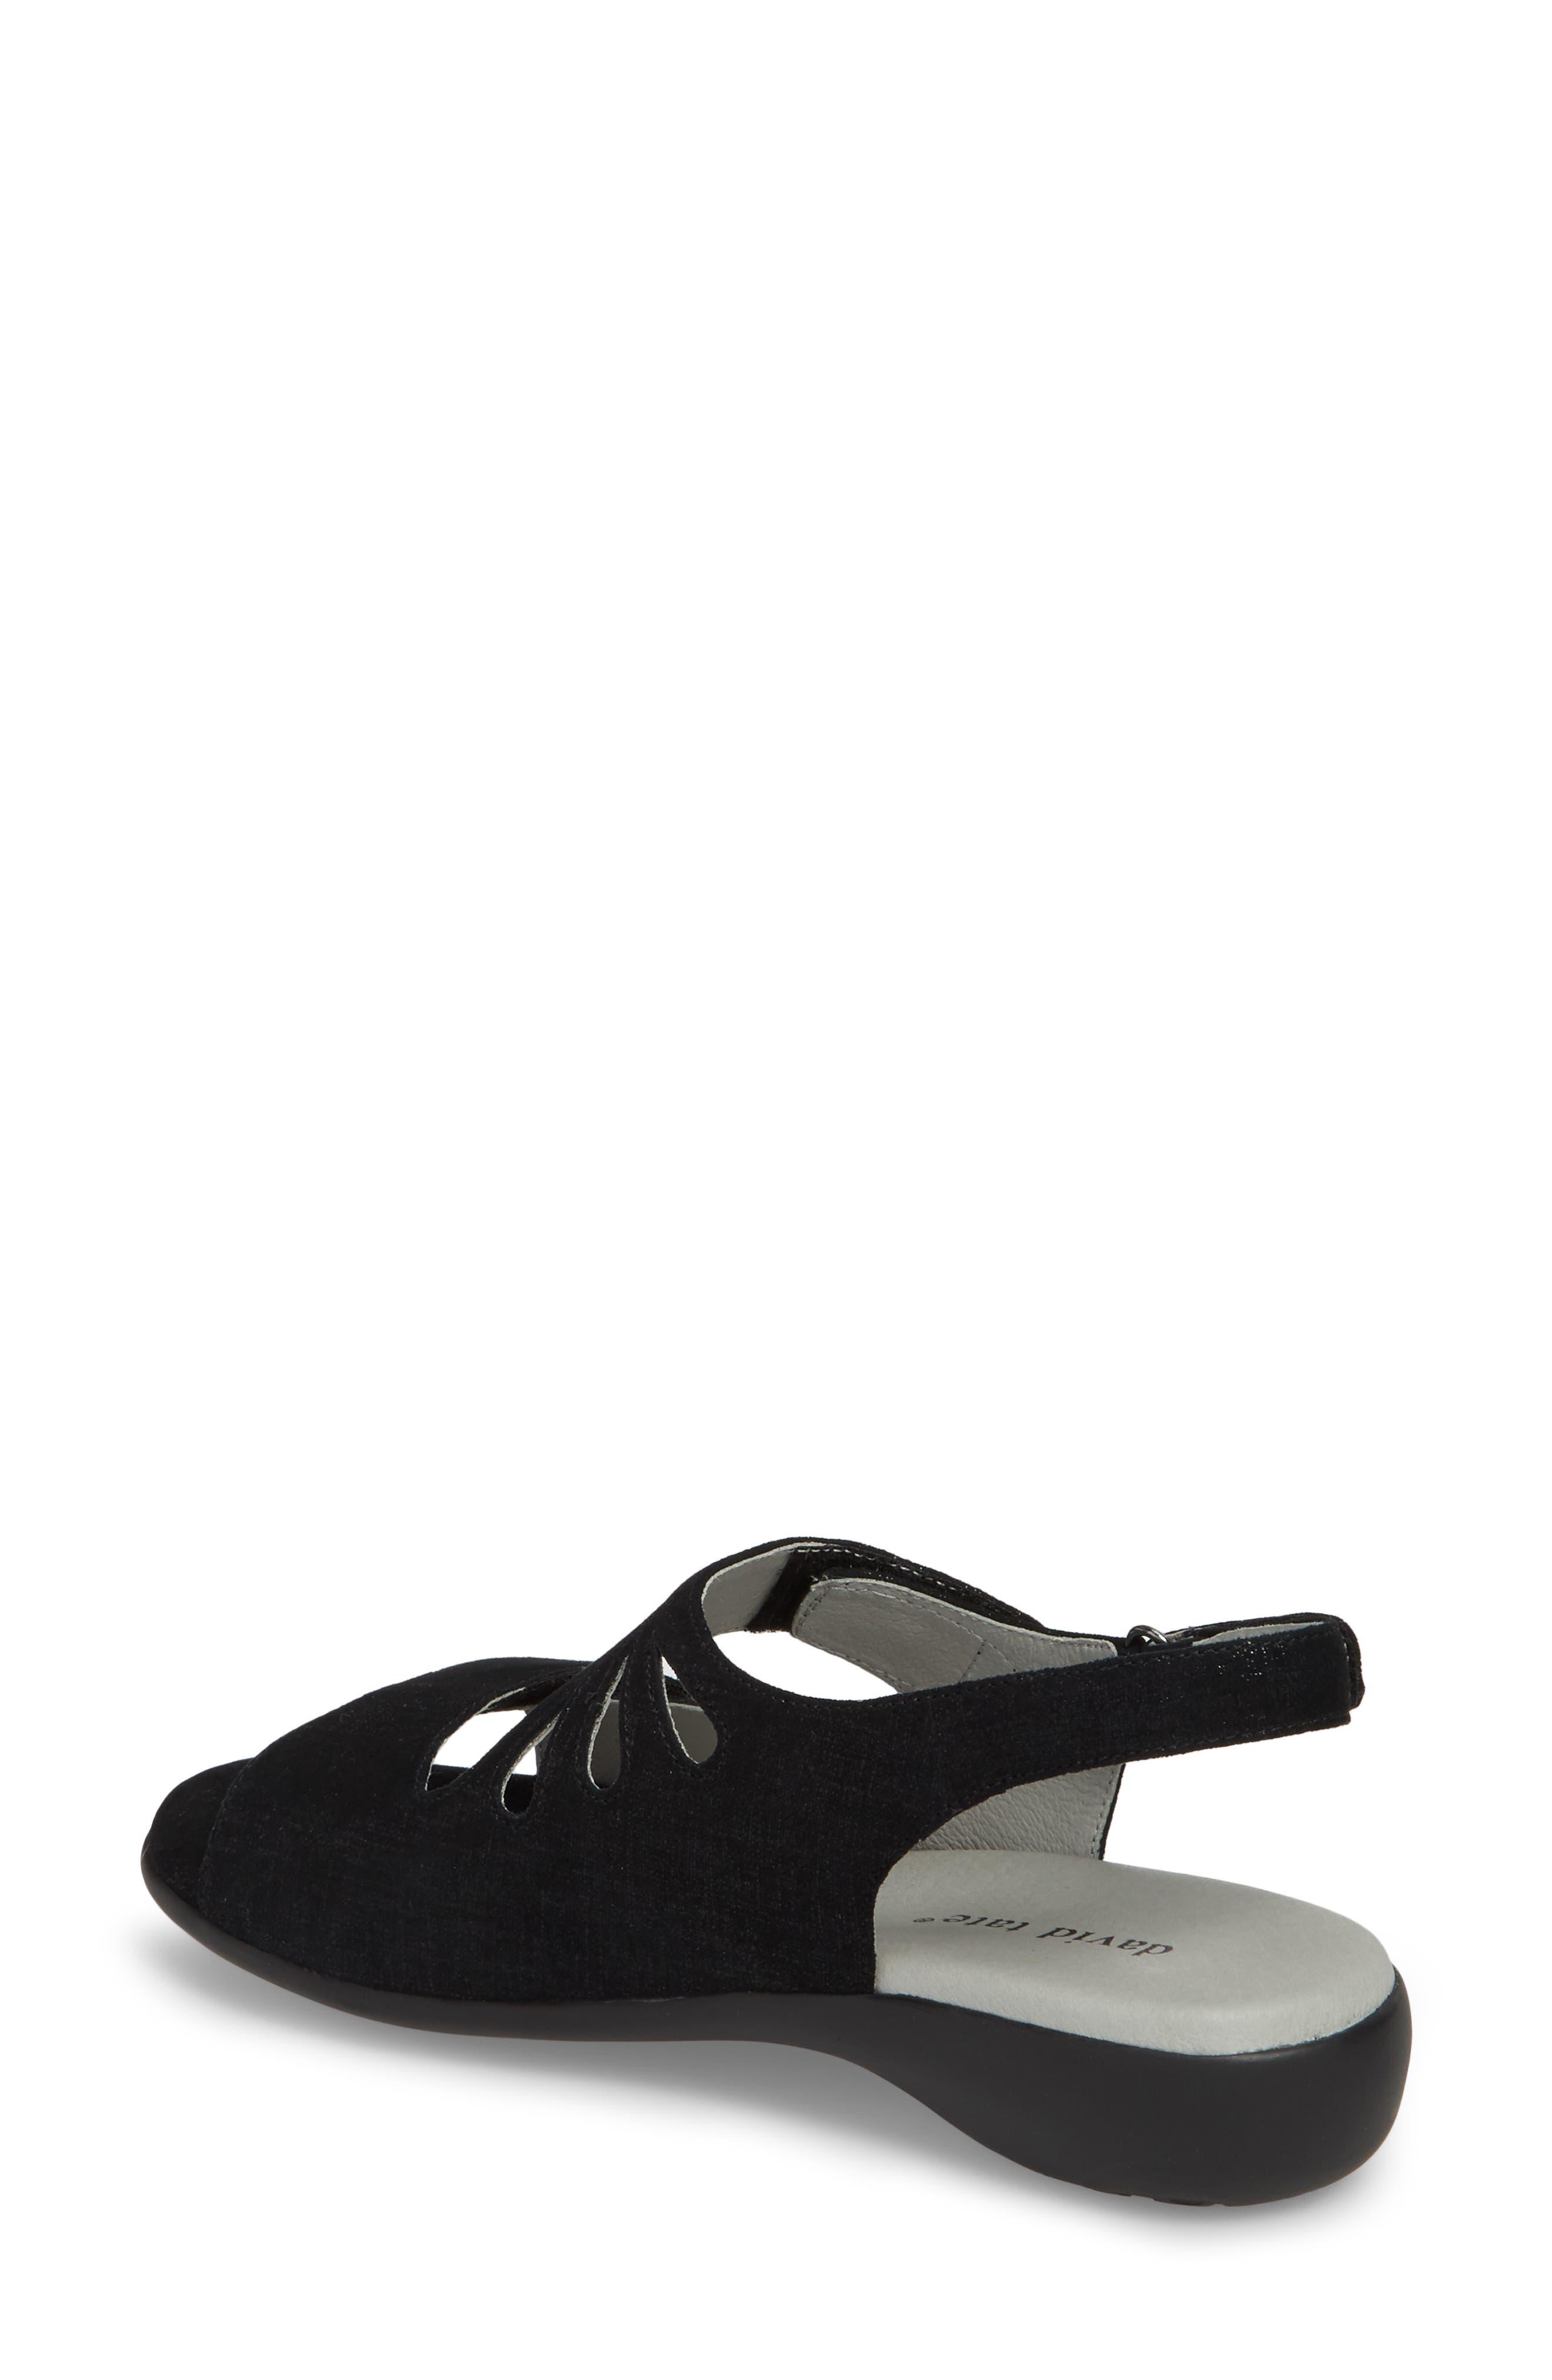 Lilly Slingback Sandal,                             Alternate thumbnail 2, color,                             Black Leather